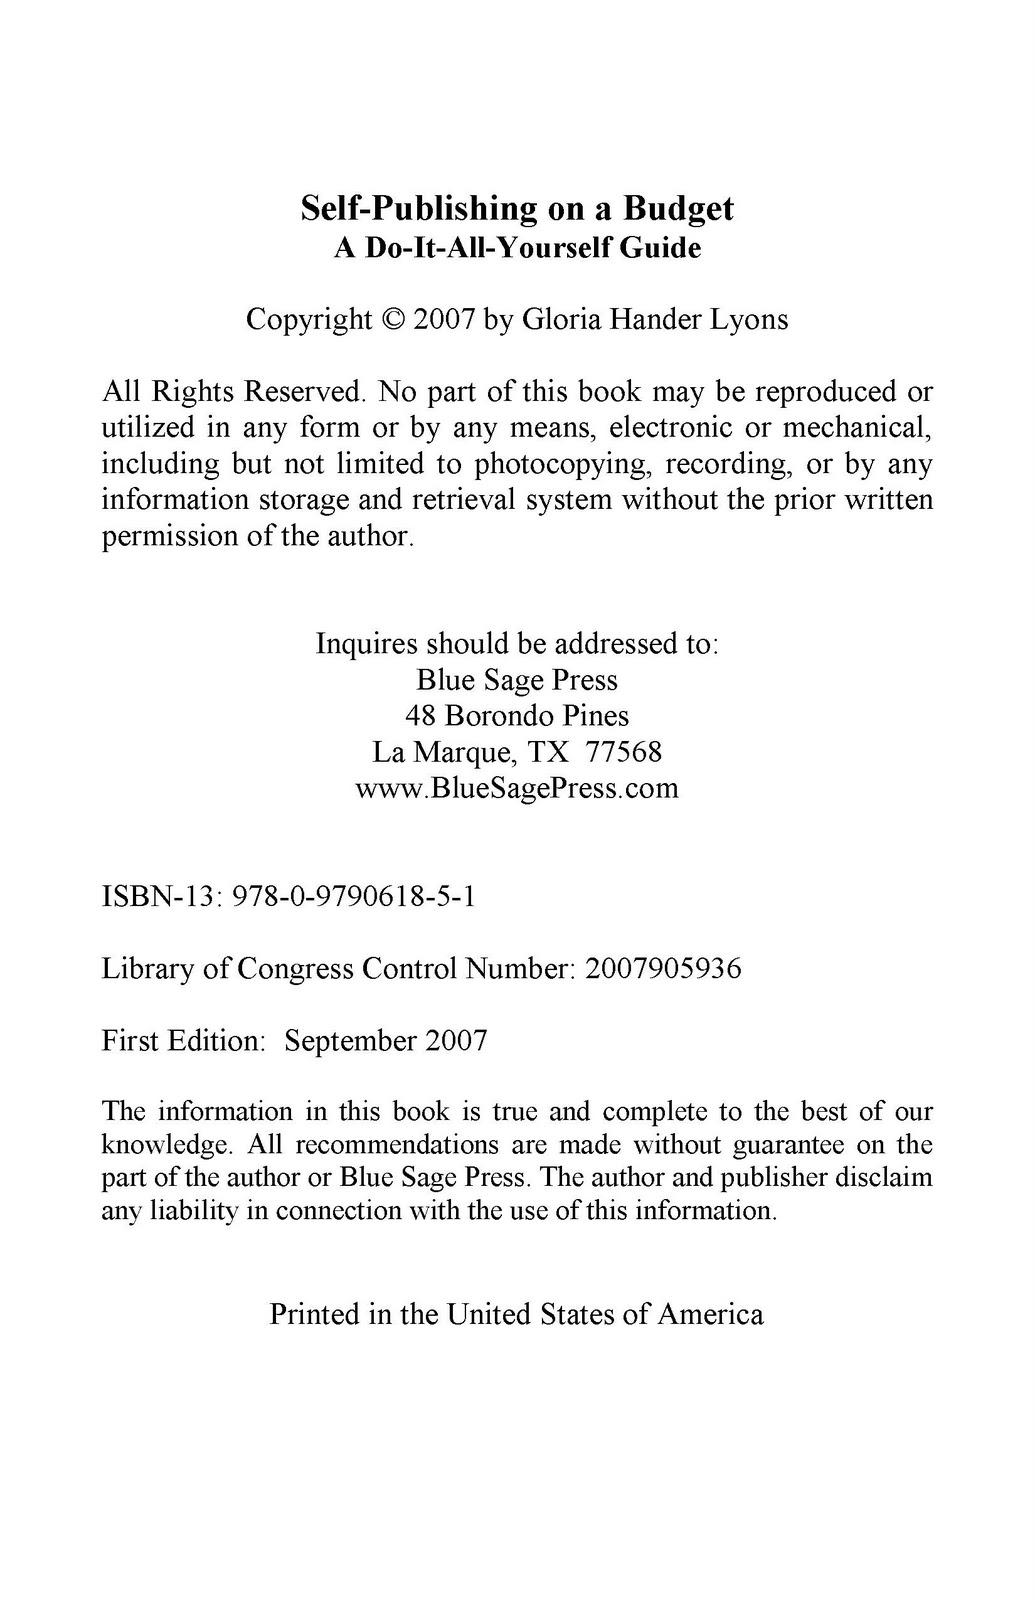 Comfortable Copyright Template For Book Photos - Example Resume ...